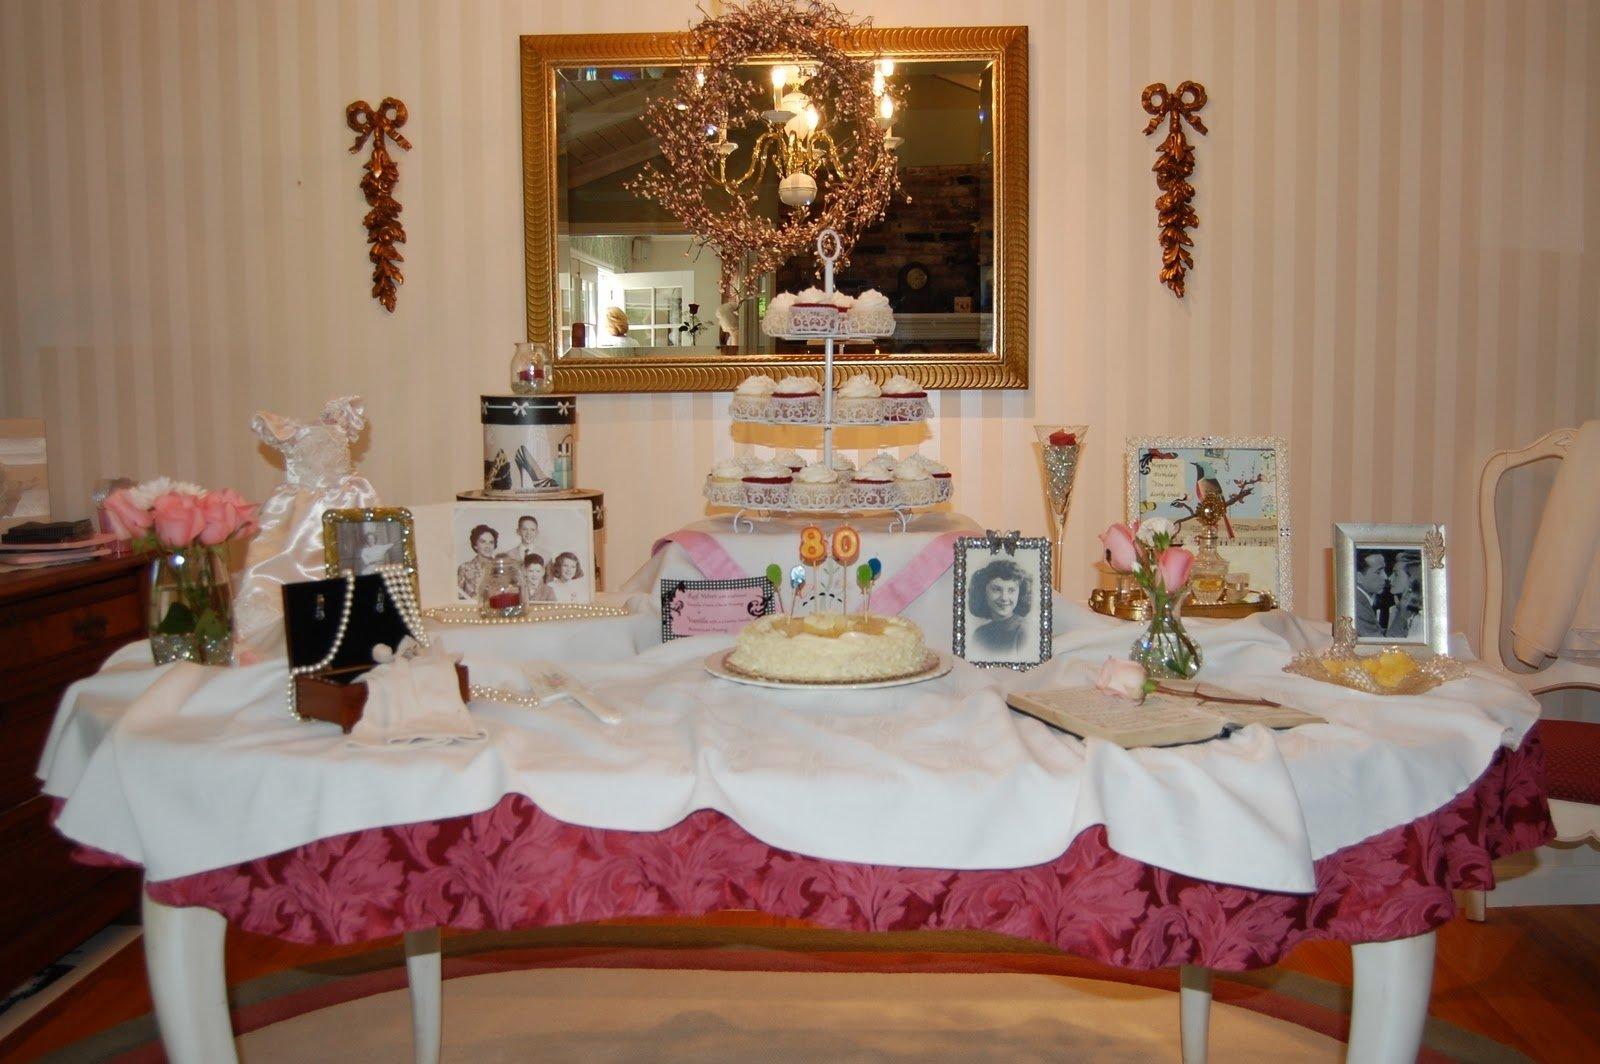 10 Unique 80Th Birthday Party Ideas For Mom grandmas vintage 80th birthday michaela noelle designs 1 2020